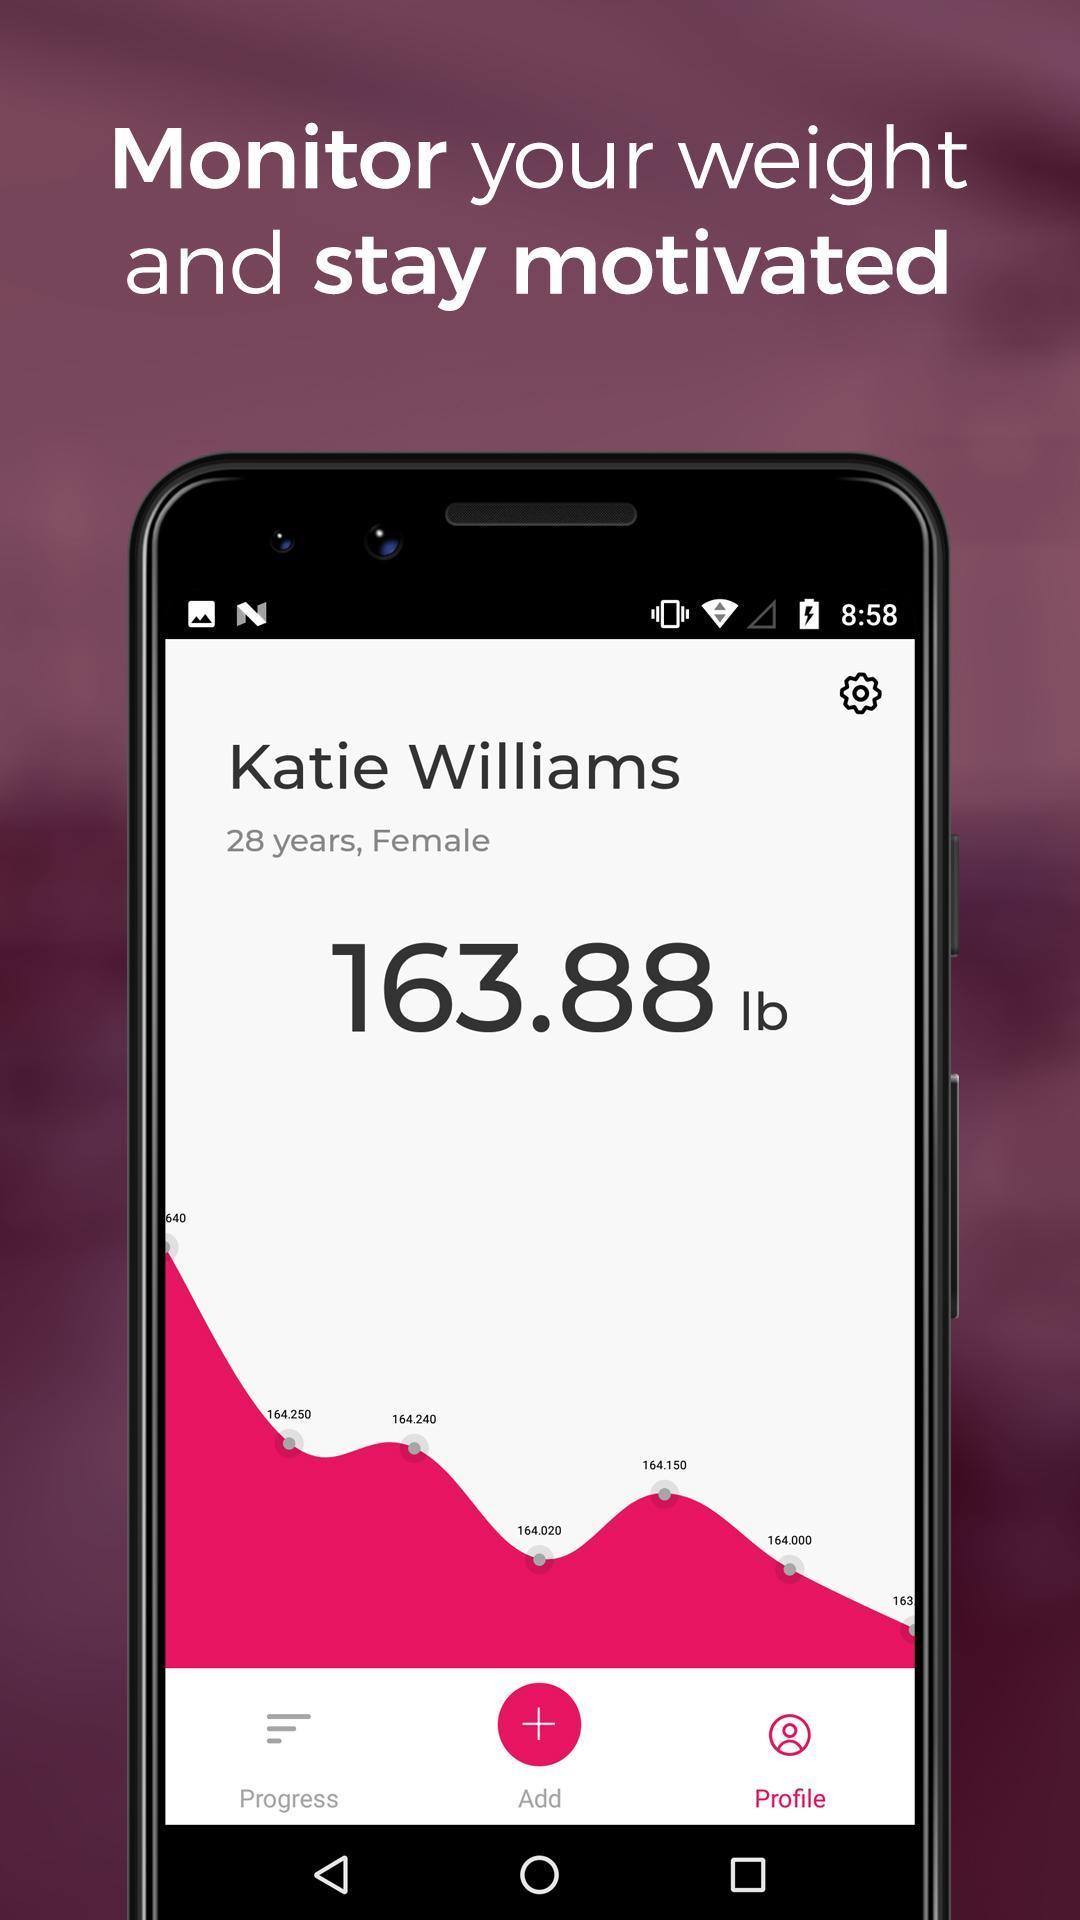 Body Tracker 360 - Weight & Body Progress Tracker for